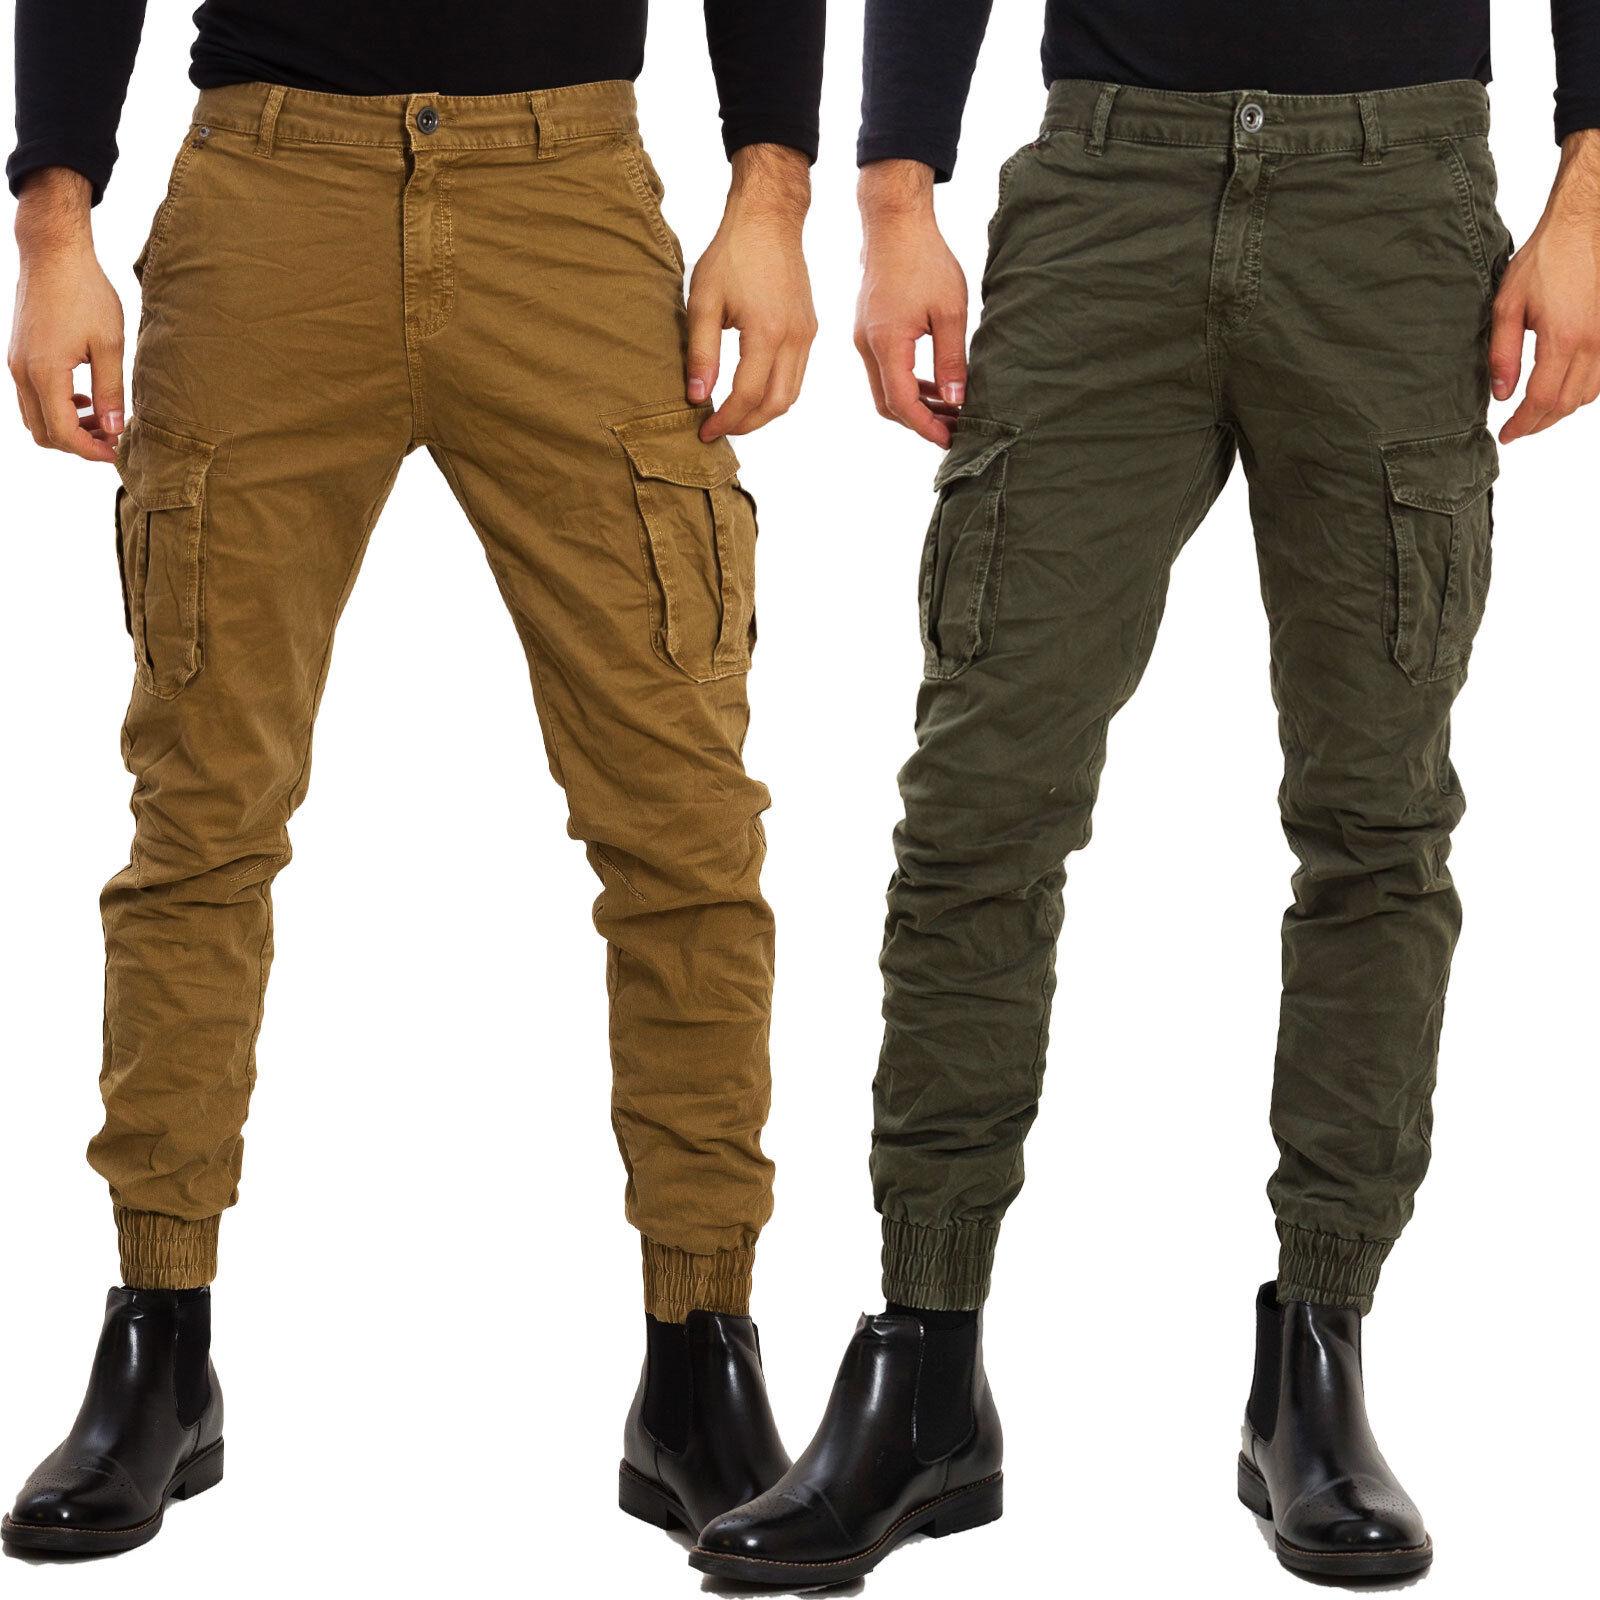 Pantalones Hombre Cargo Casual Slim Fit Militares Bolsillos Laterales Toocool Ebay